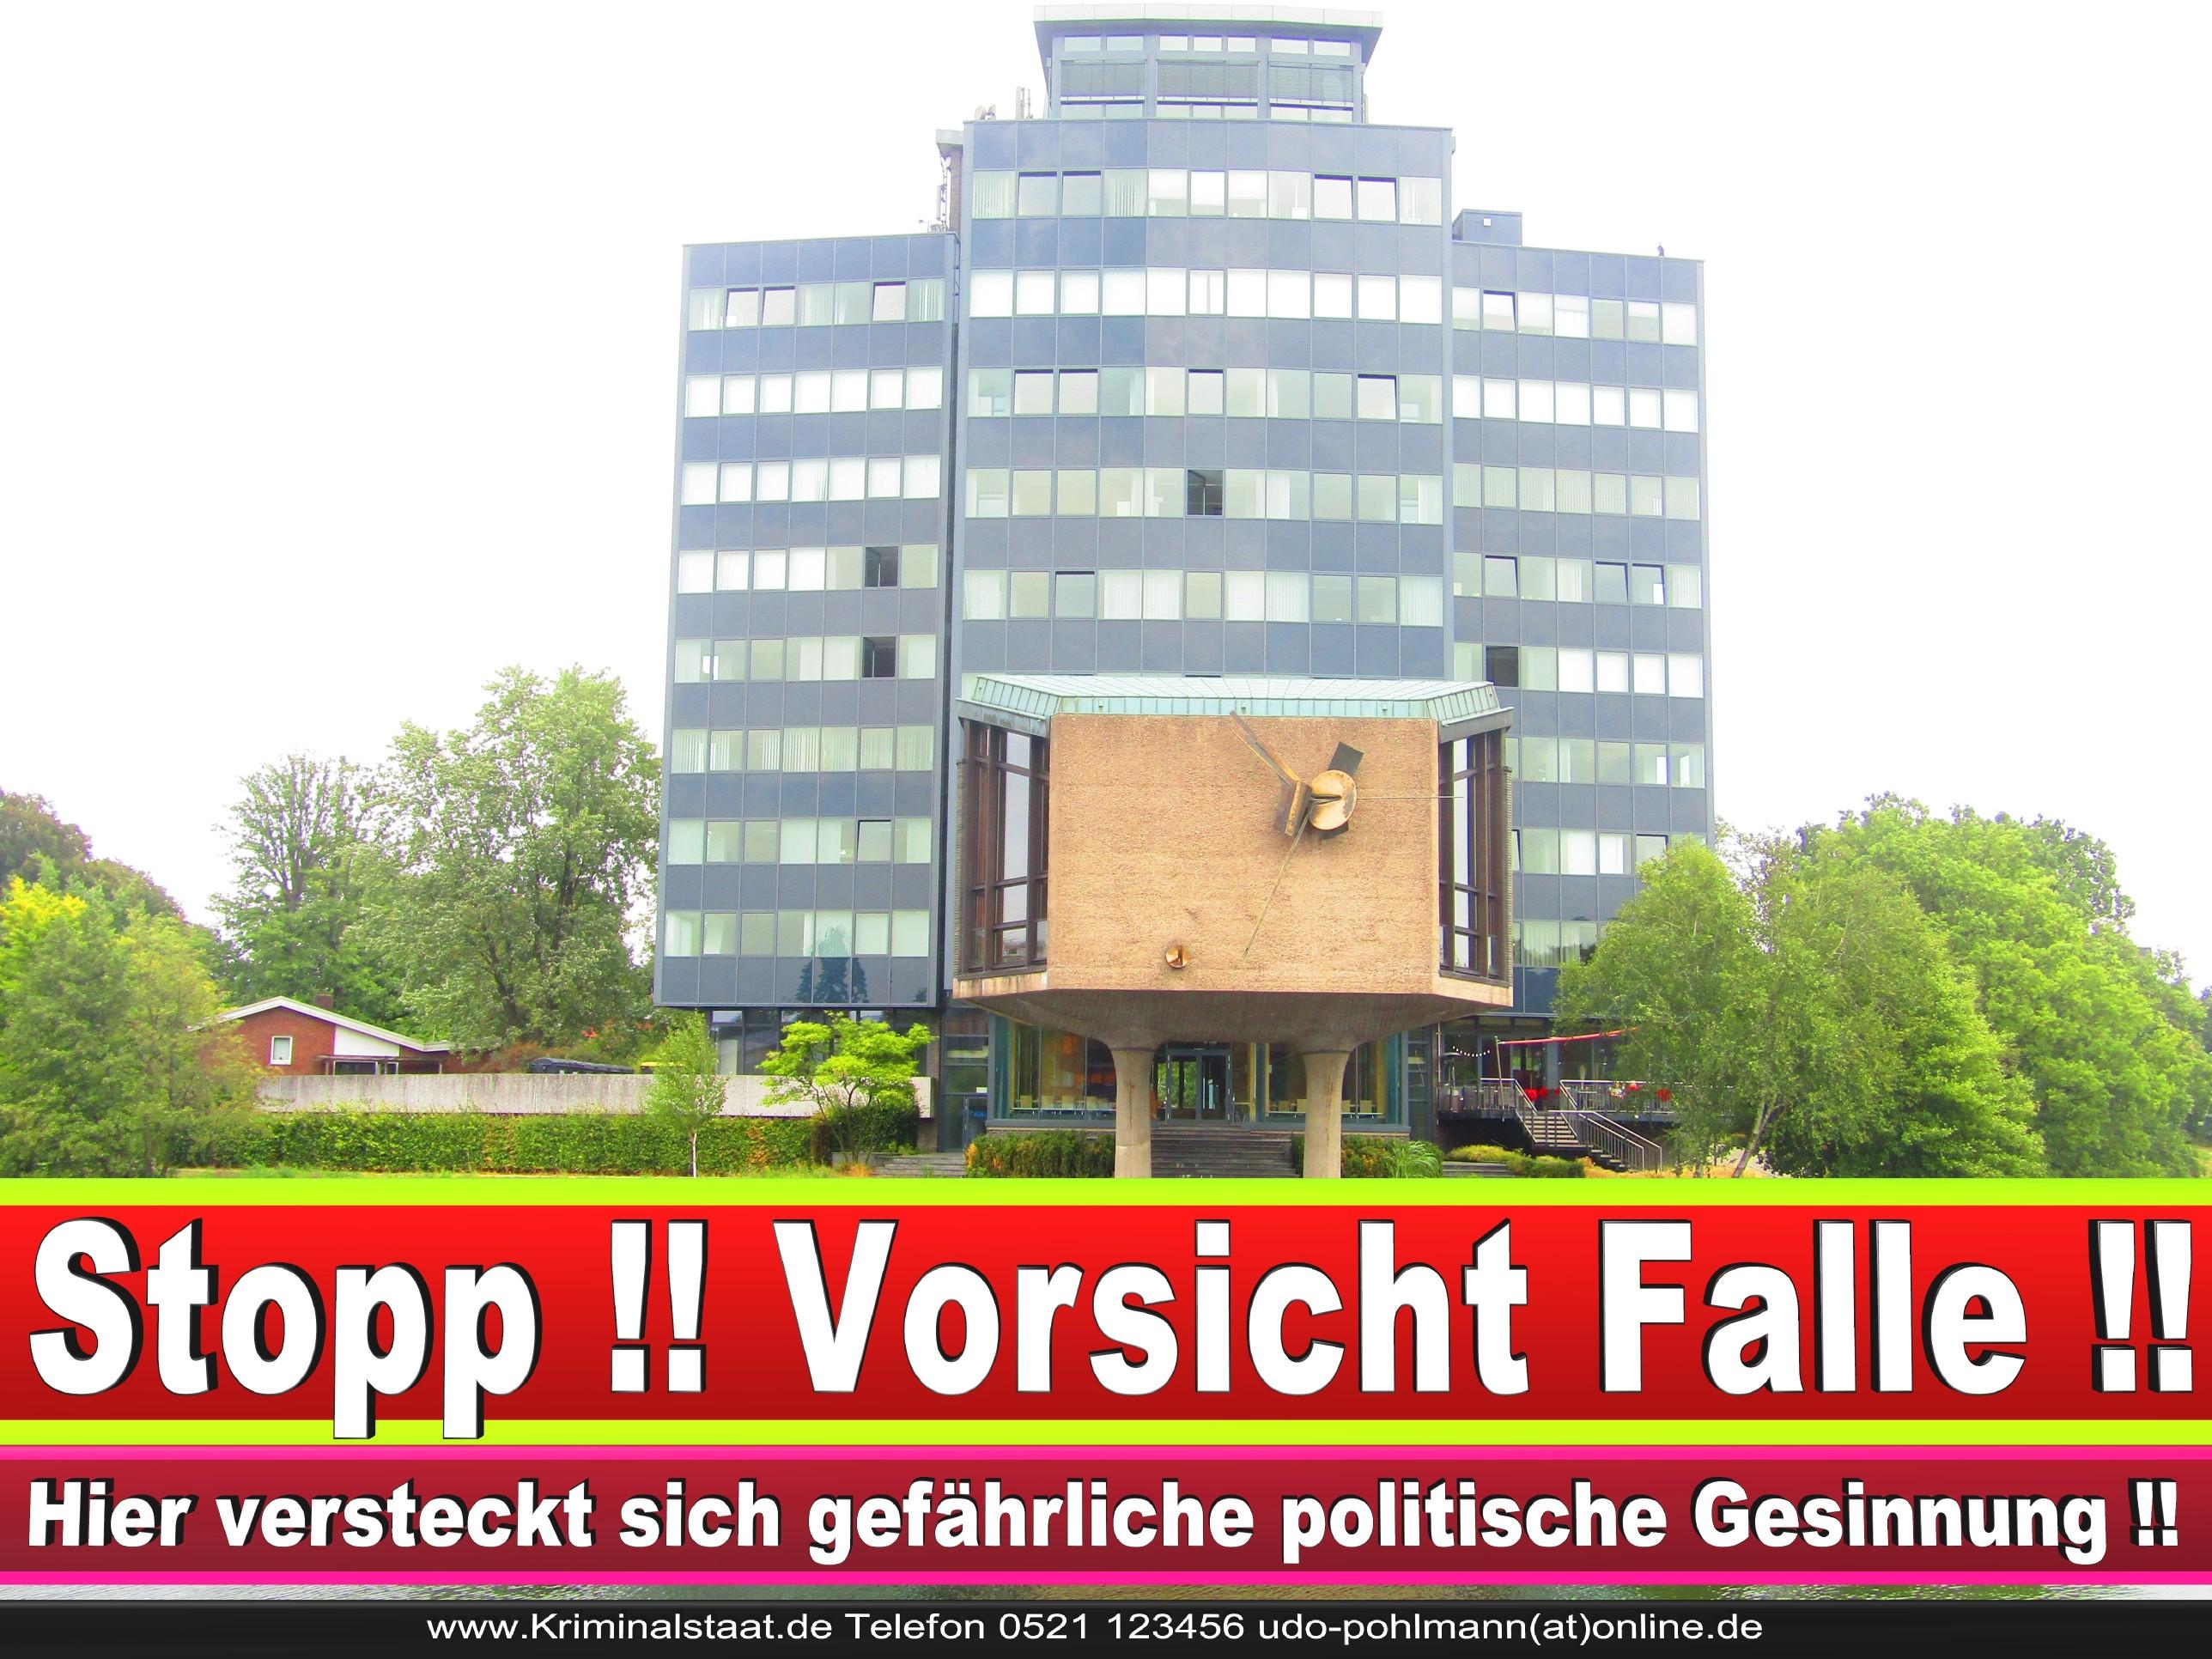 SENNESTADTVEREIN CDU BIELEFELD 1 LANDTAGSWAHL BUNDESTAGSWAHL BÜRGERMEISTERWAHL